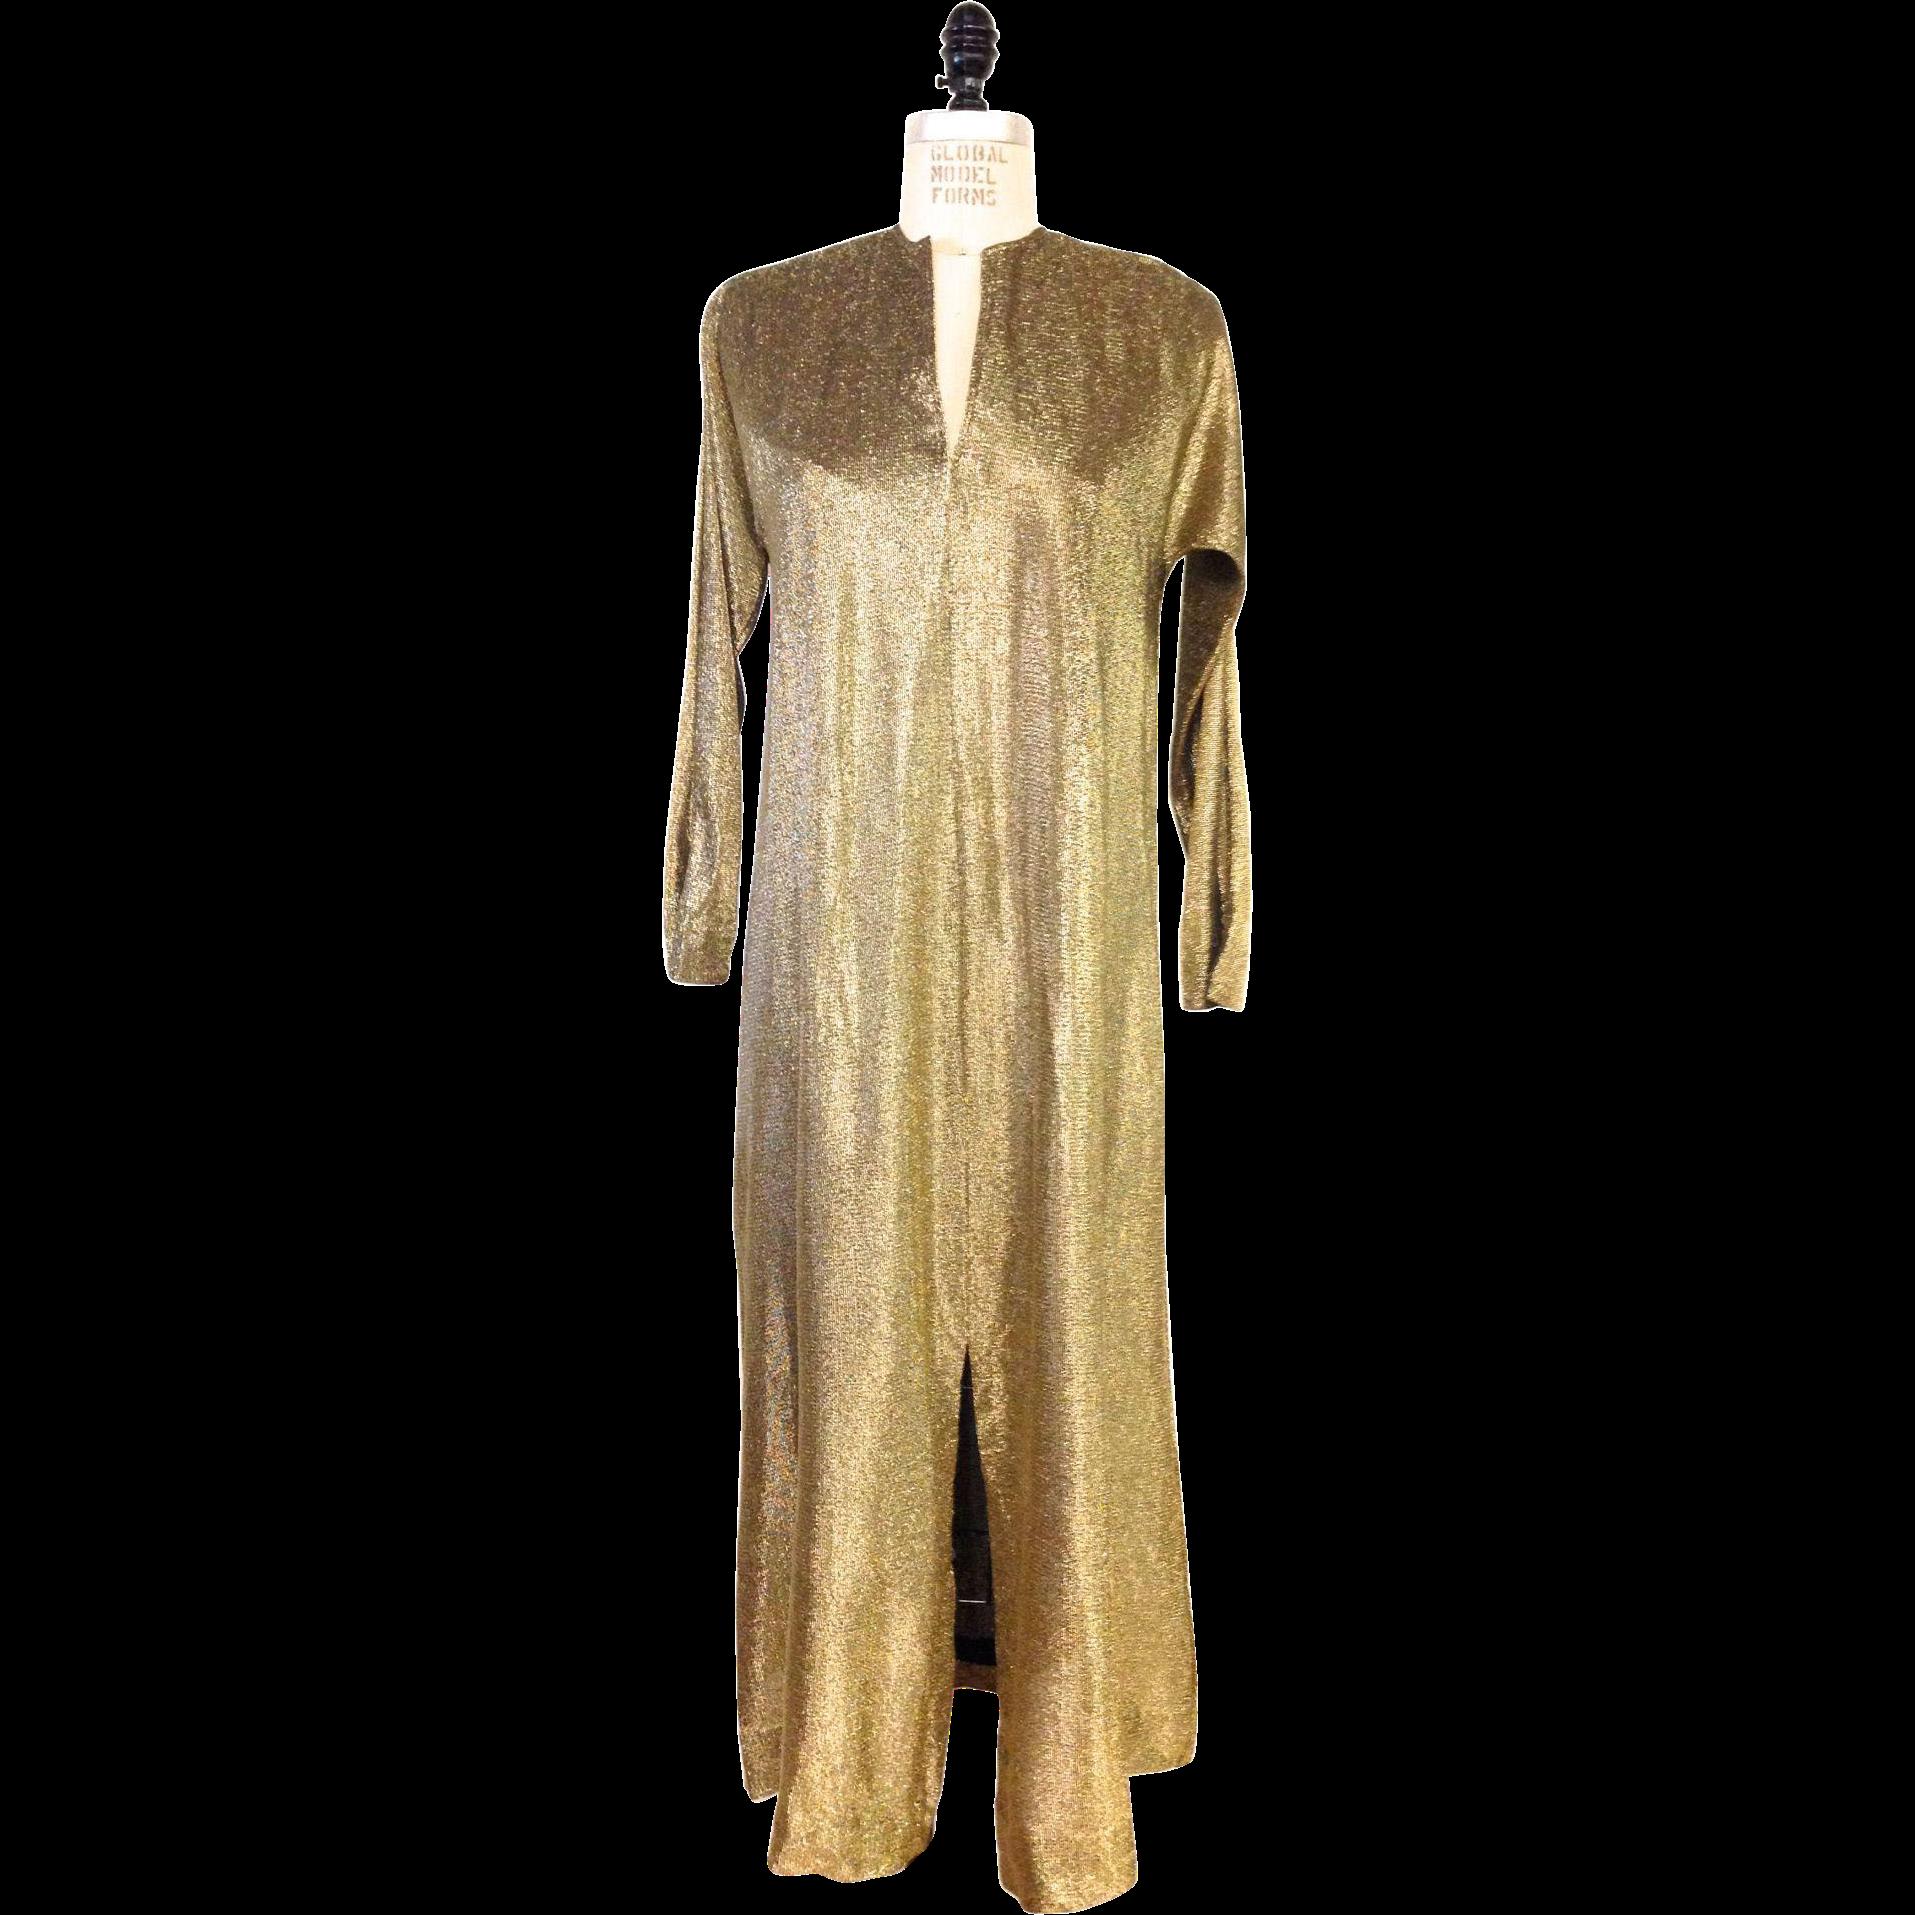 ?? 1970s Vintage Gold Metallic Halston IV Dress or Caftan